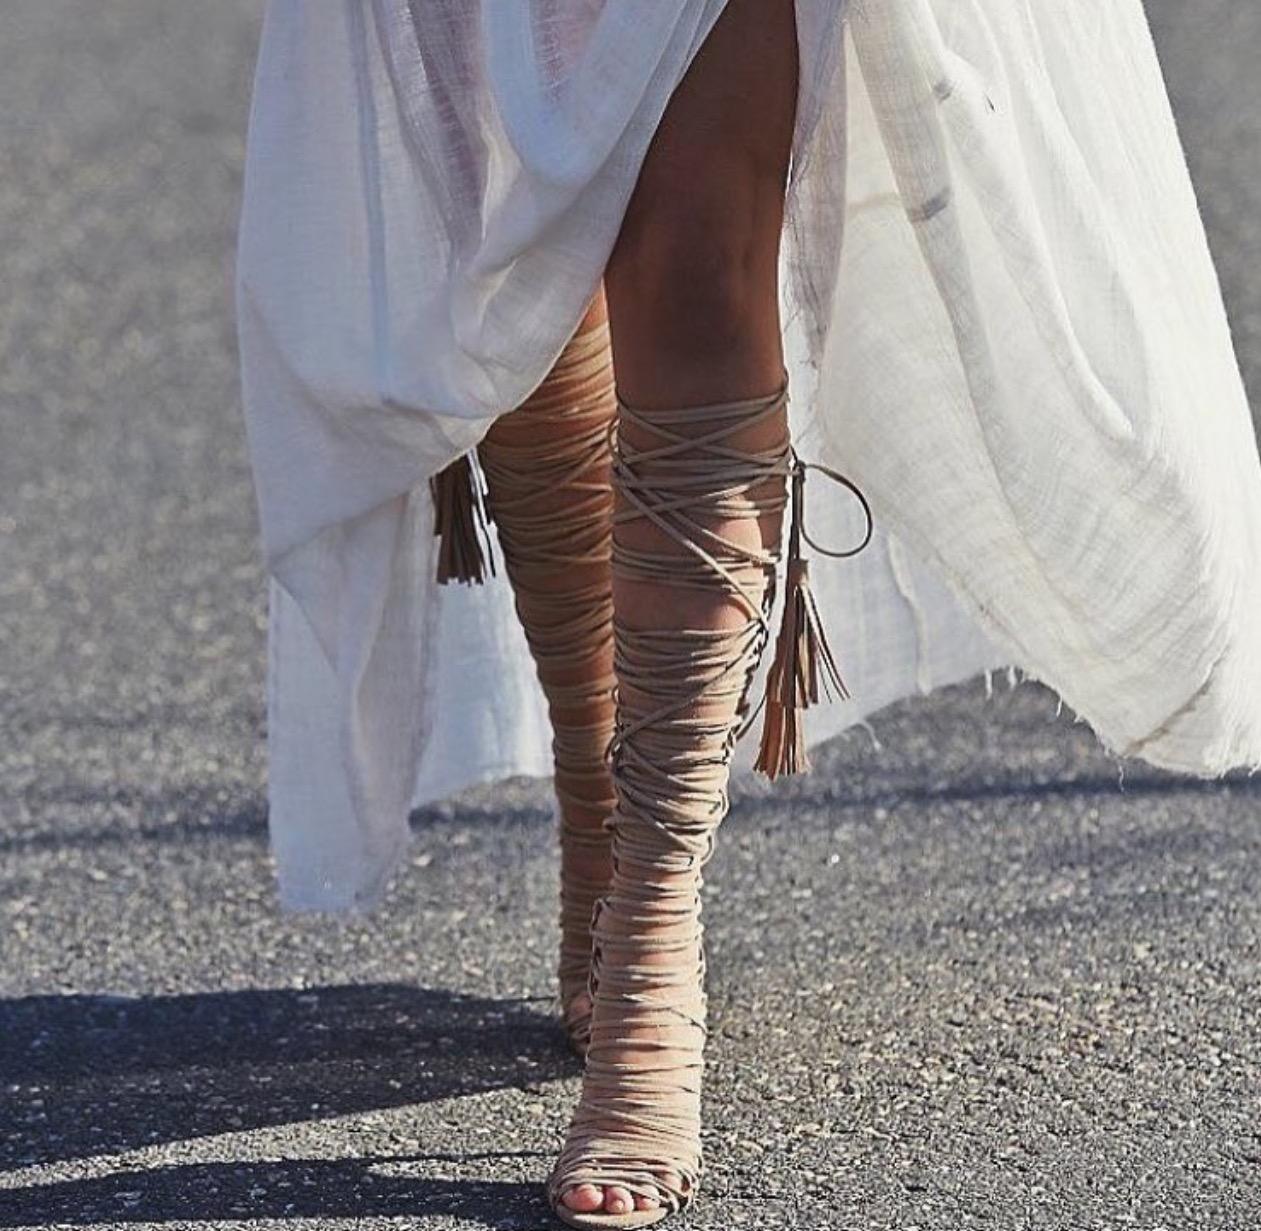 "<a href=""http://www.instagram.com/afashionablelife/"" target=""_blank"">@fashionablelife</a>"